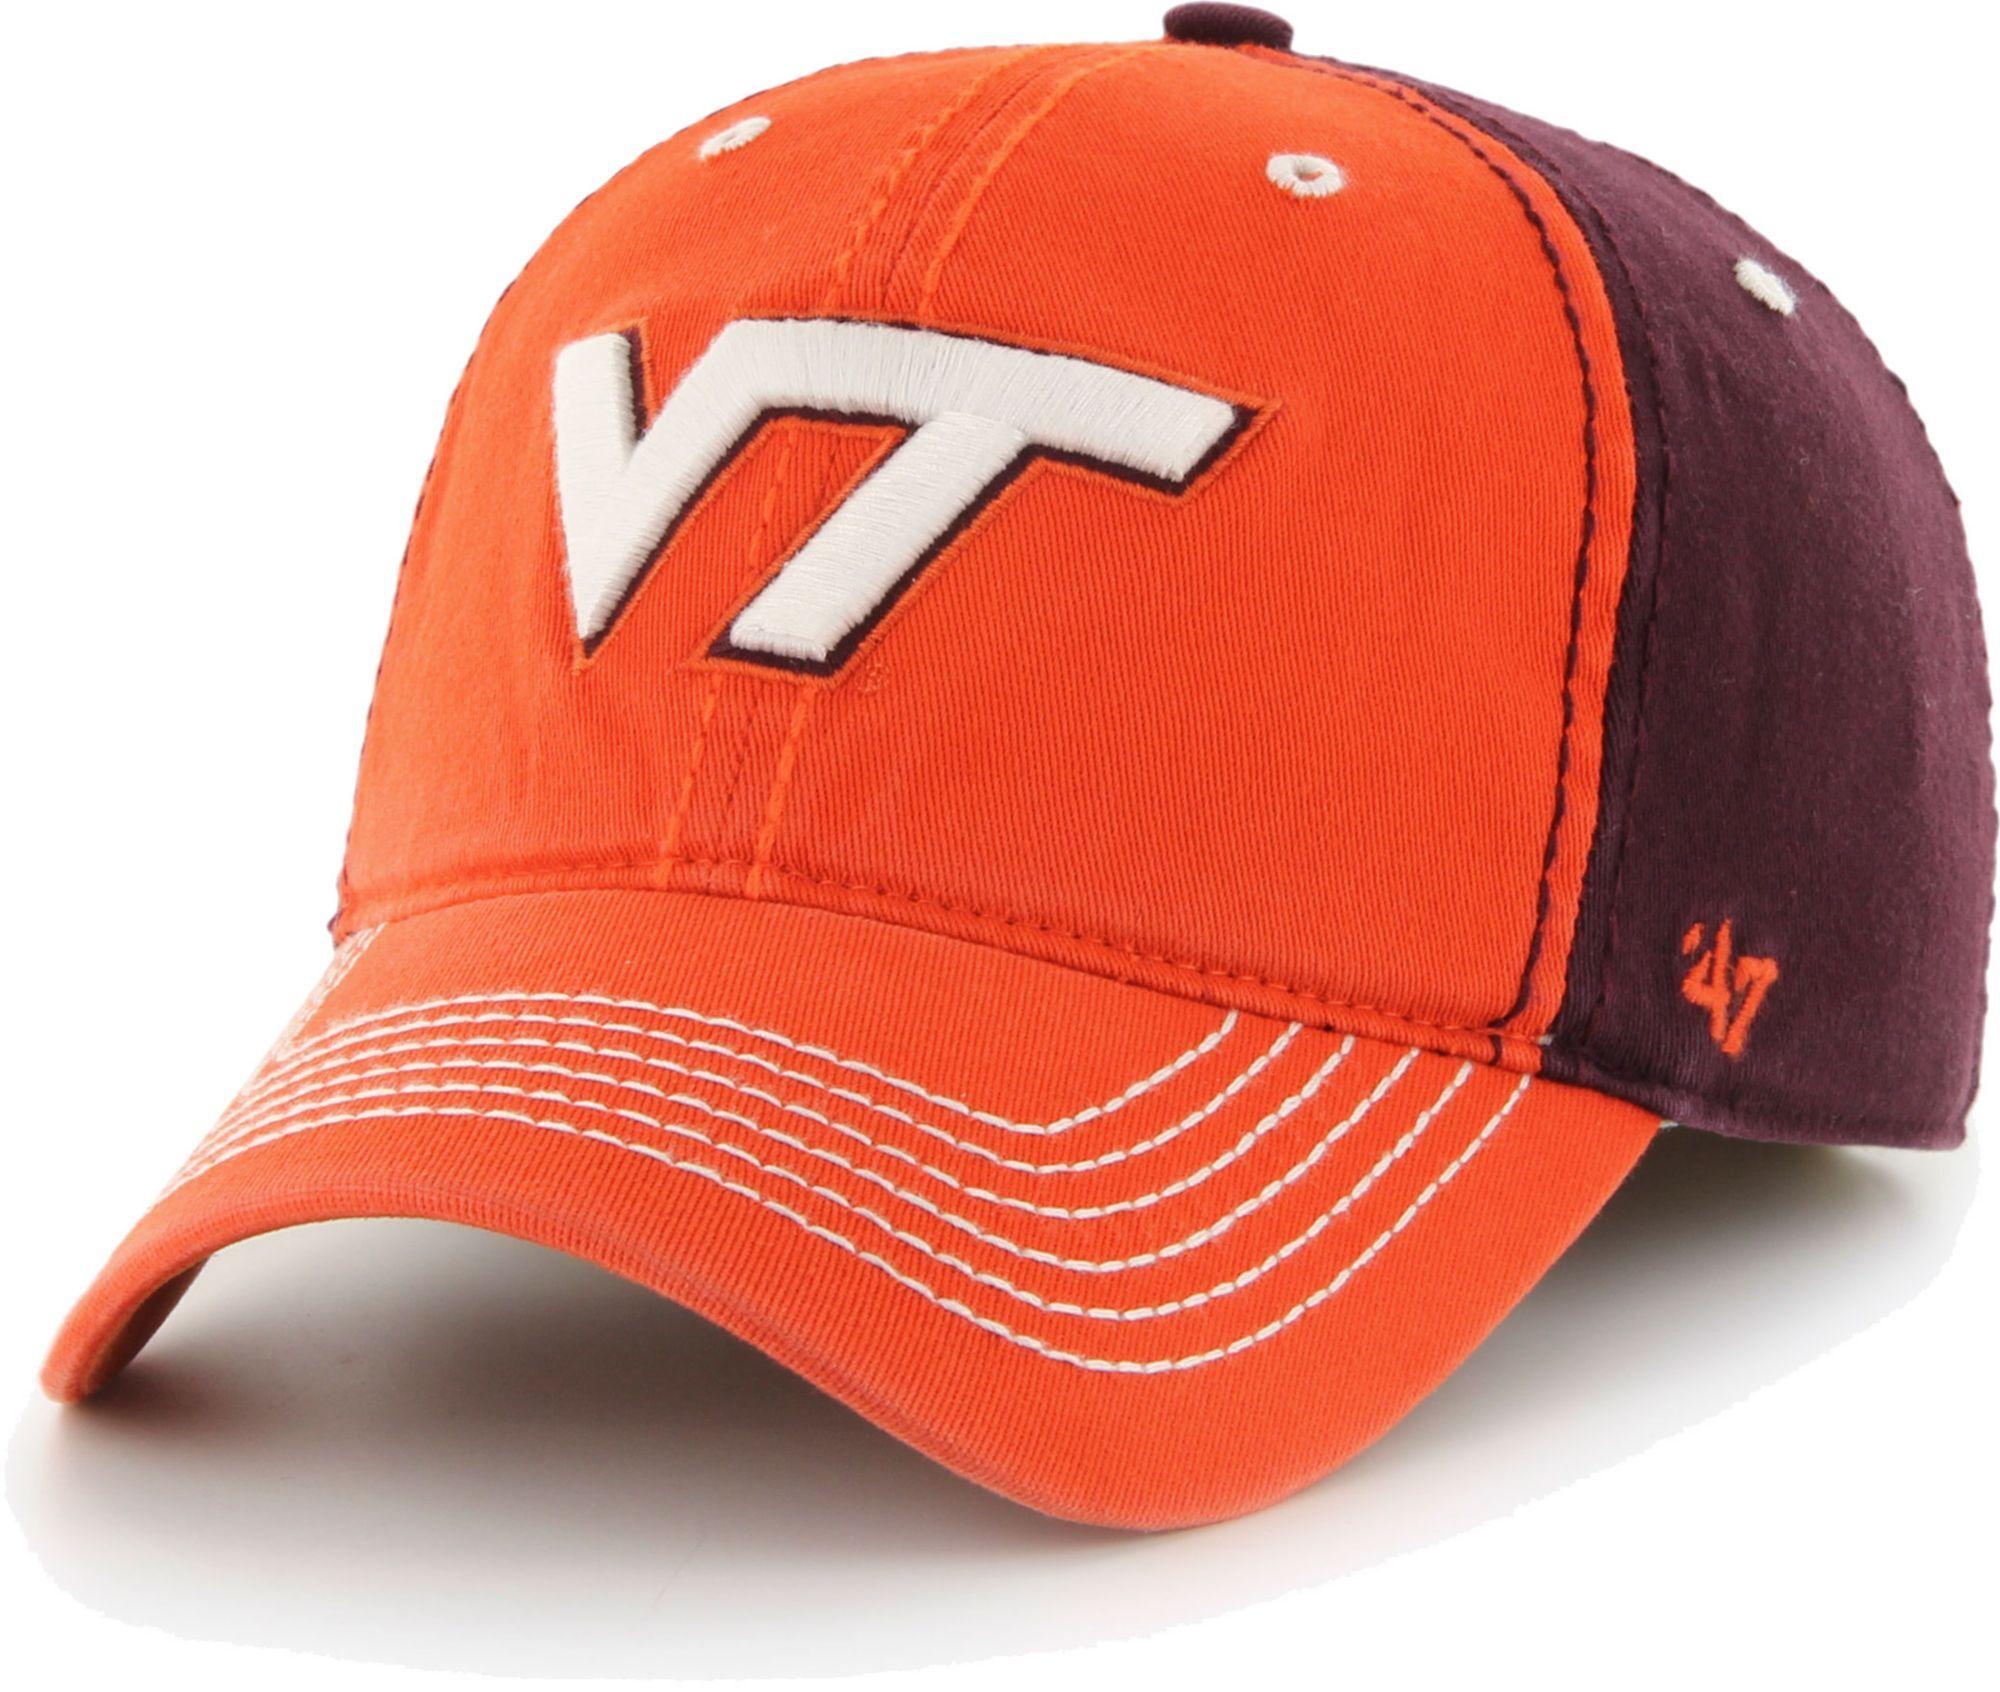 '47 '47 Men's Virginia Tech Hokies Burnt Orange Phase Flexfit Hat, Red